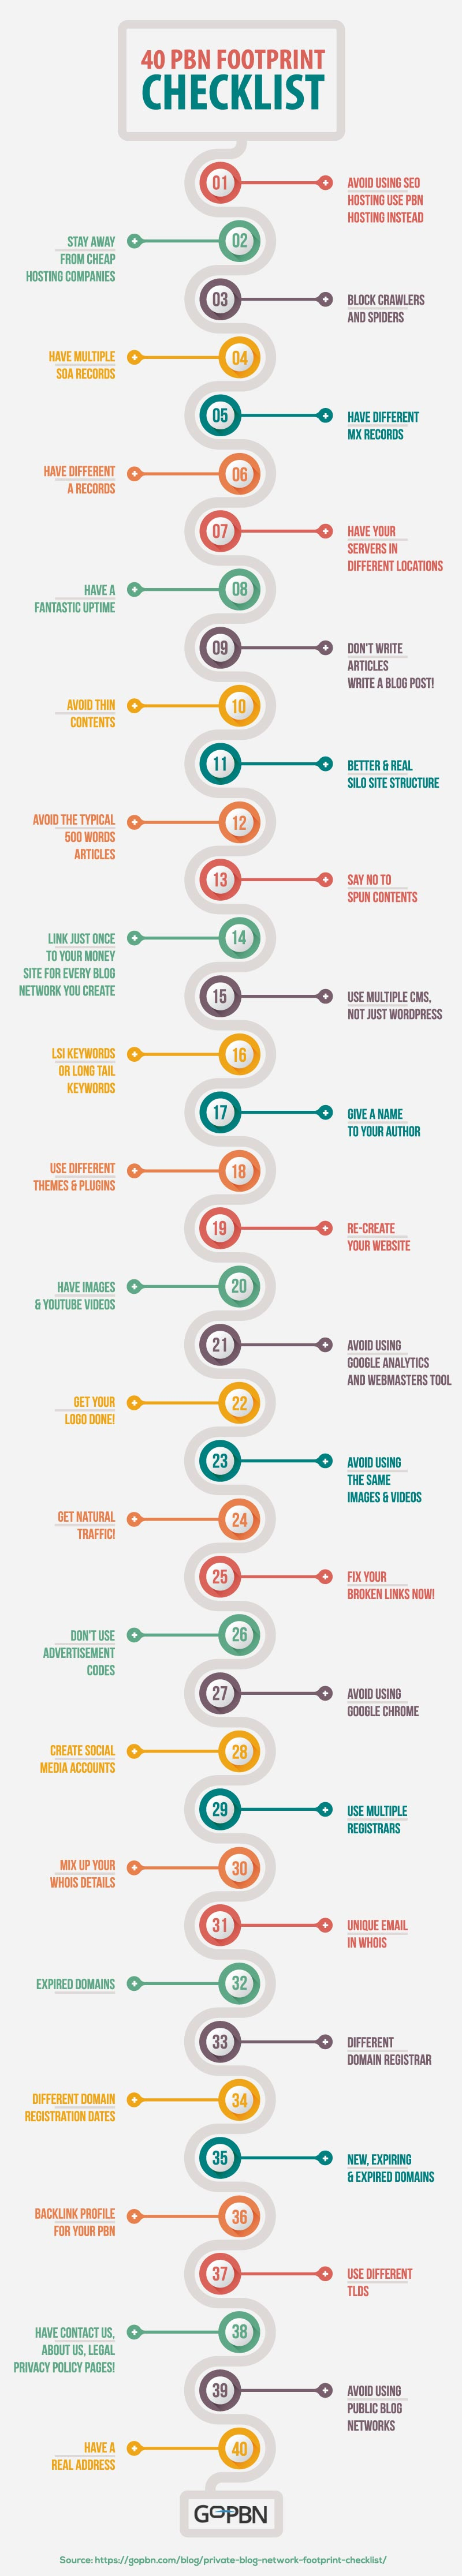 pbn footprint checklist infographics